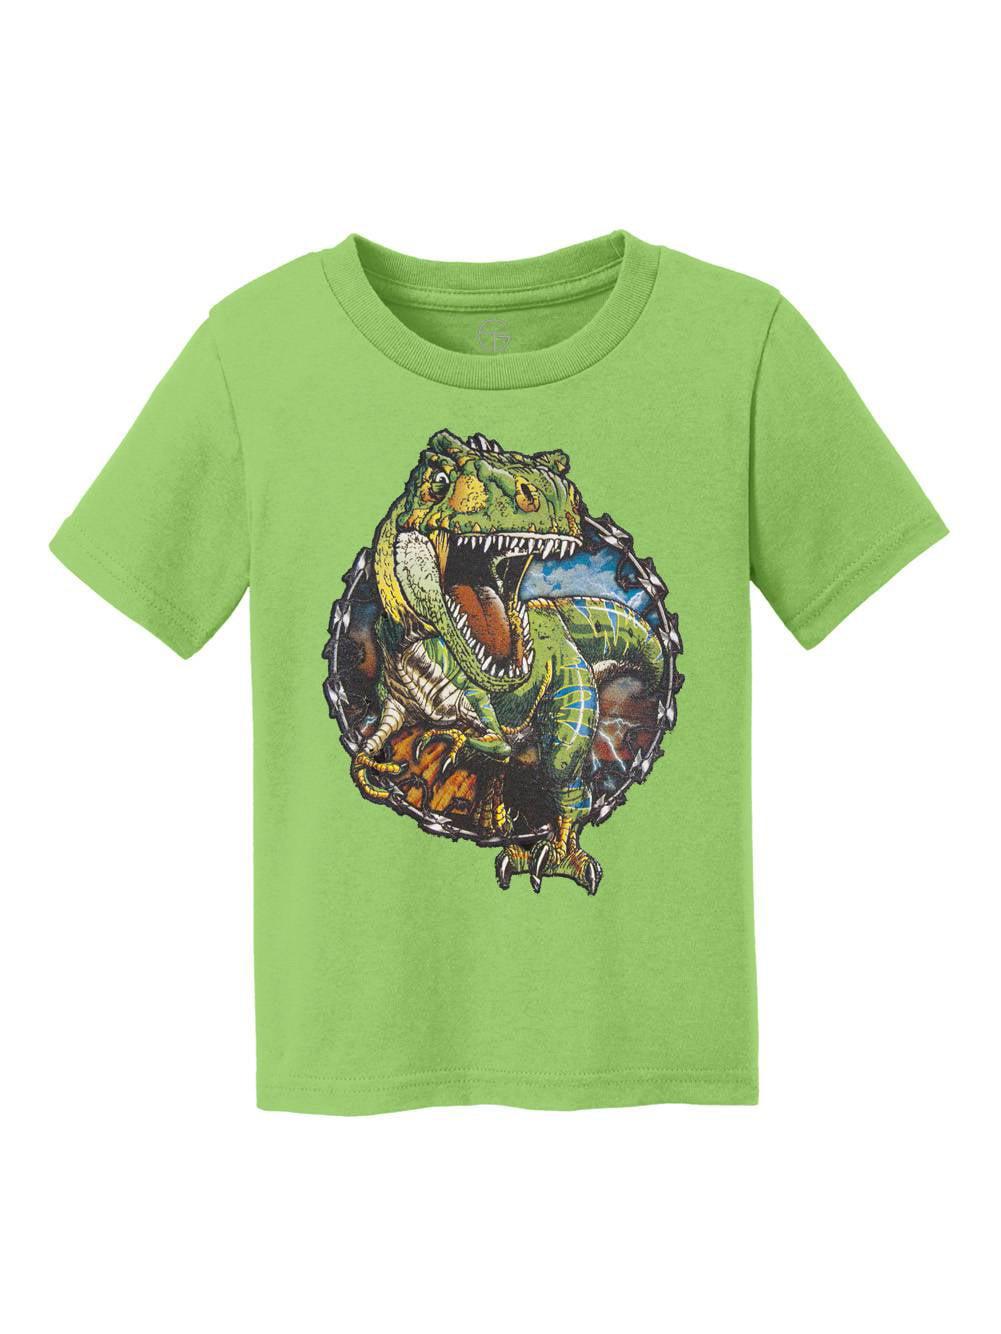 Tyrannosaurus Rex Youth Cotton T-Shirt